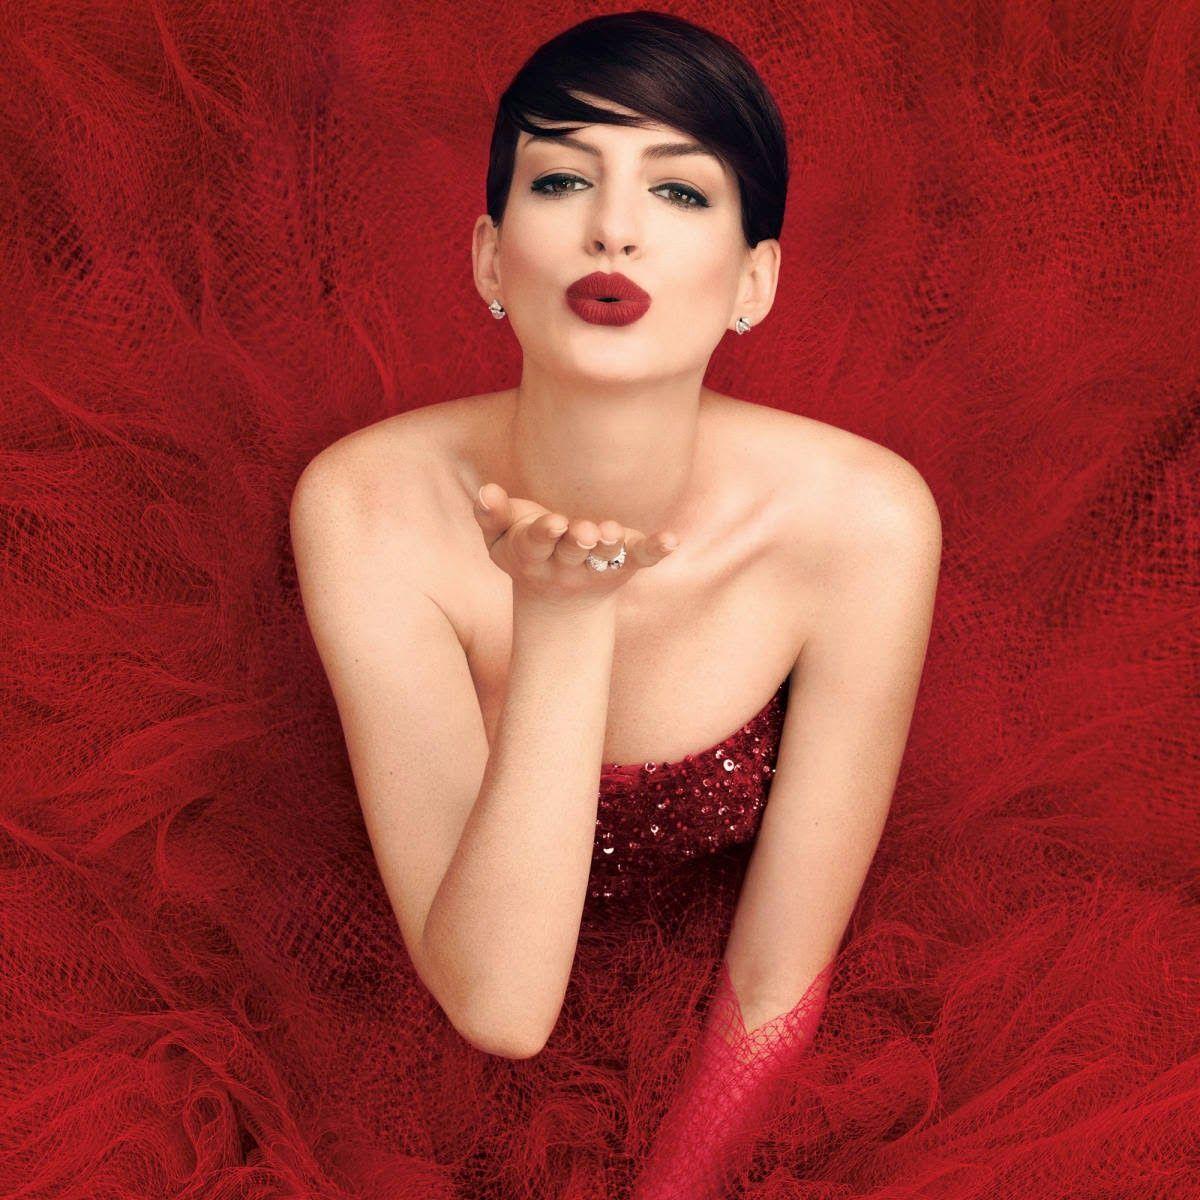 Anne Hathaway - Harper's Bazaar Magazine Photos - Sexy Actress Pictures | Hot Actress Pictures - ActressSnaps.com